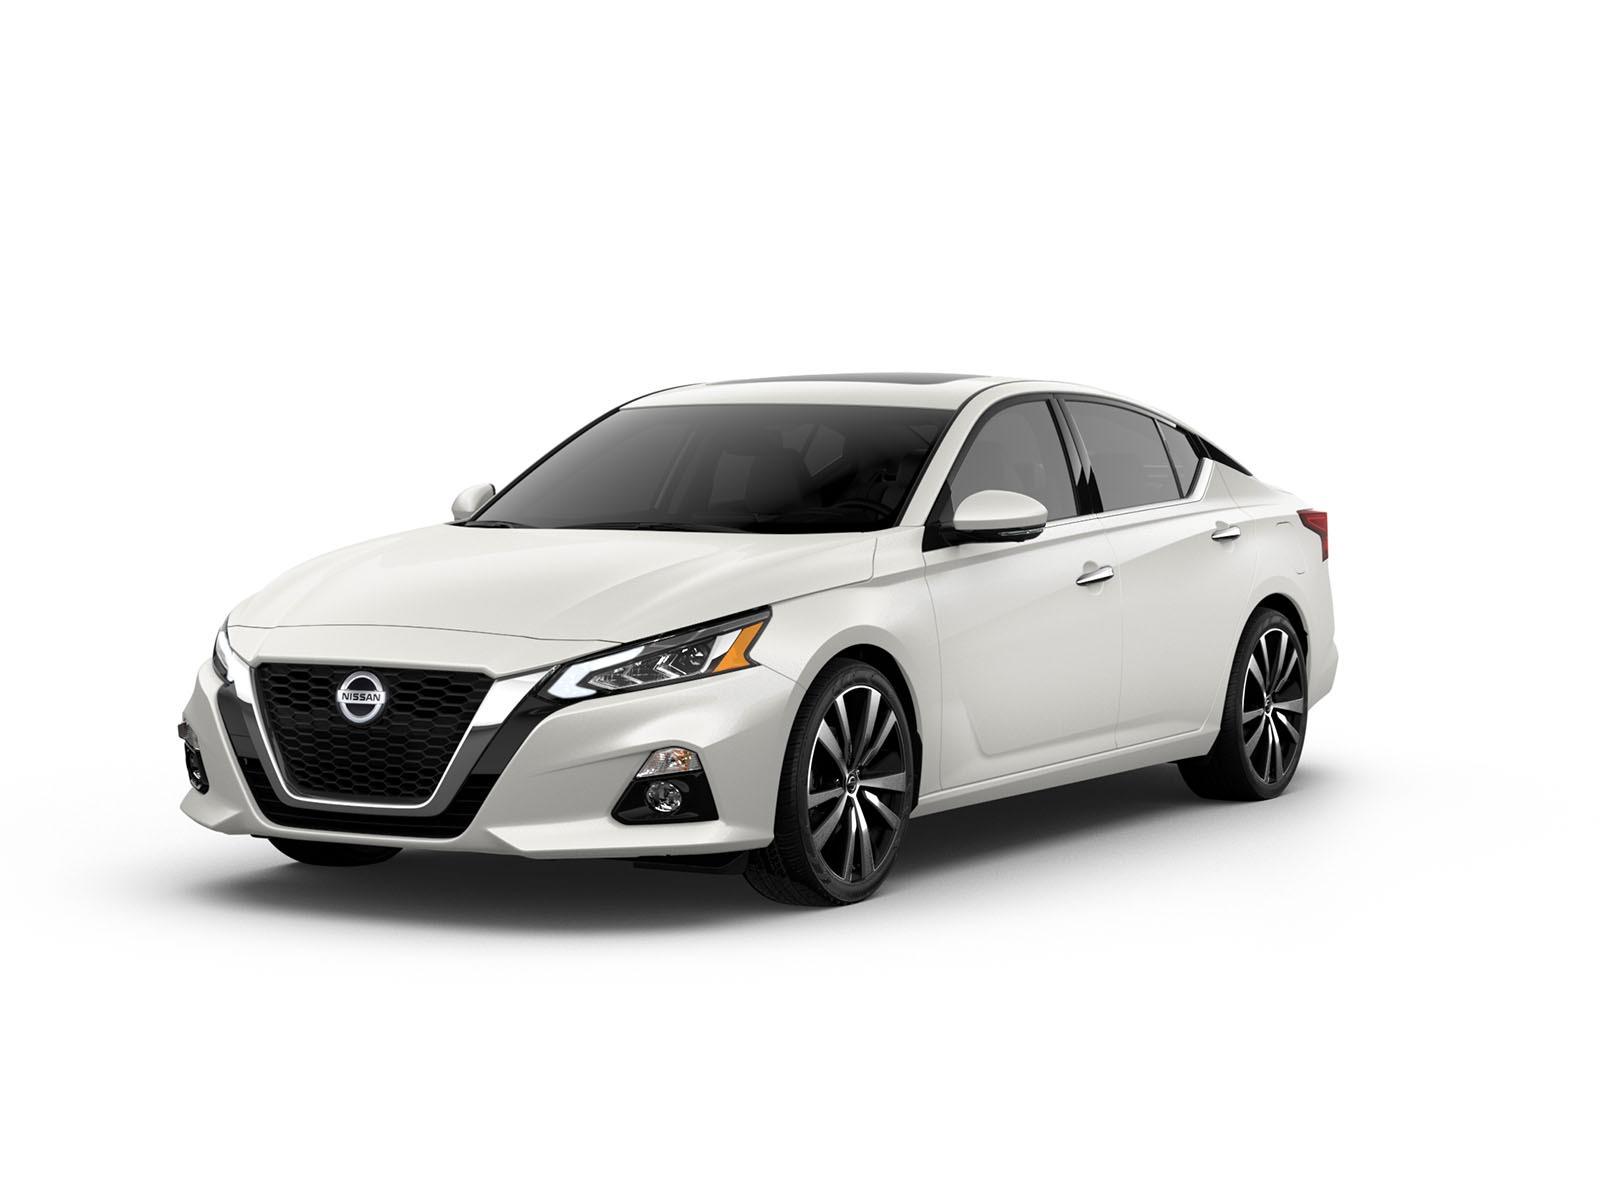 2020 Nissan Altima SV full